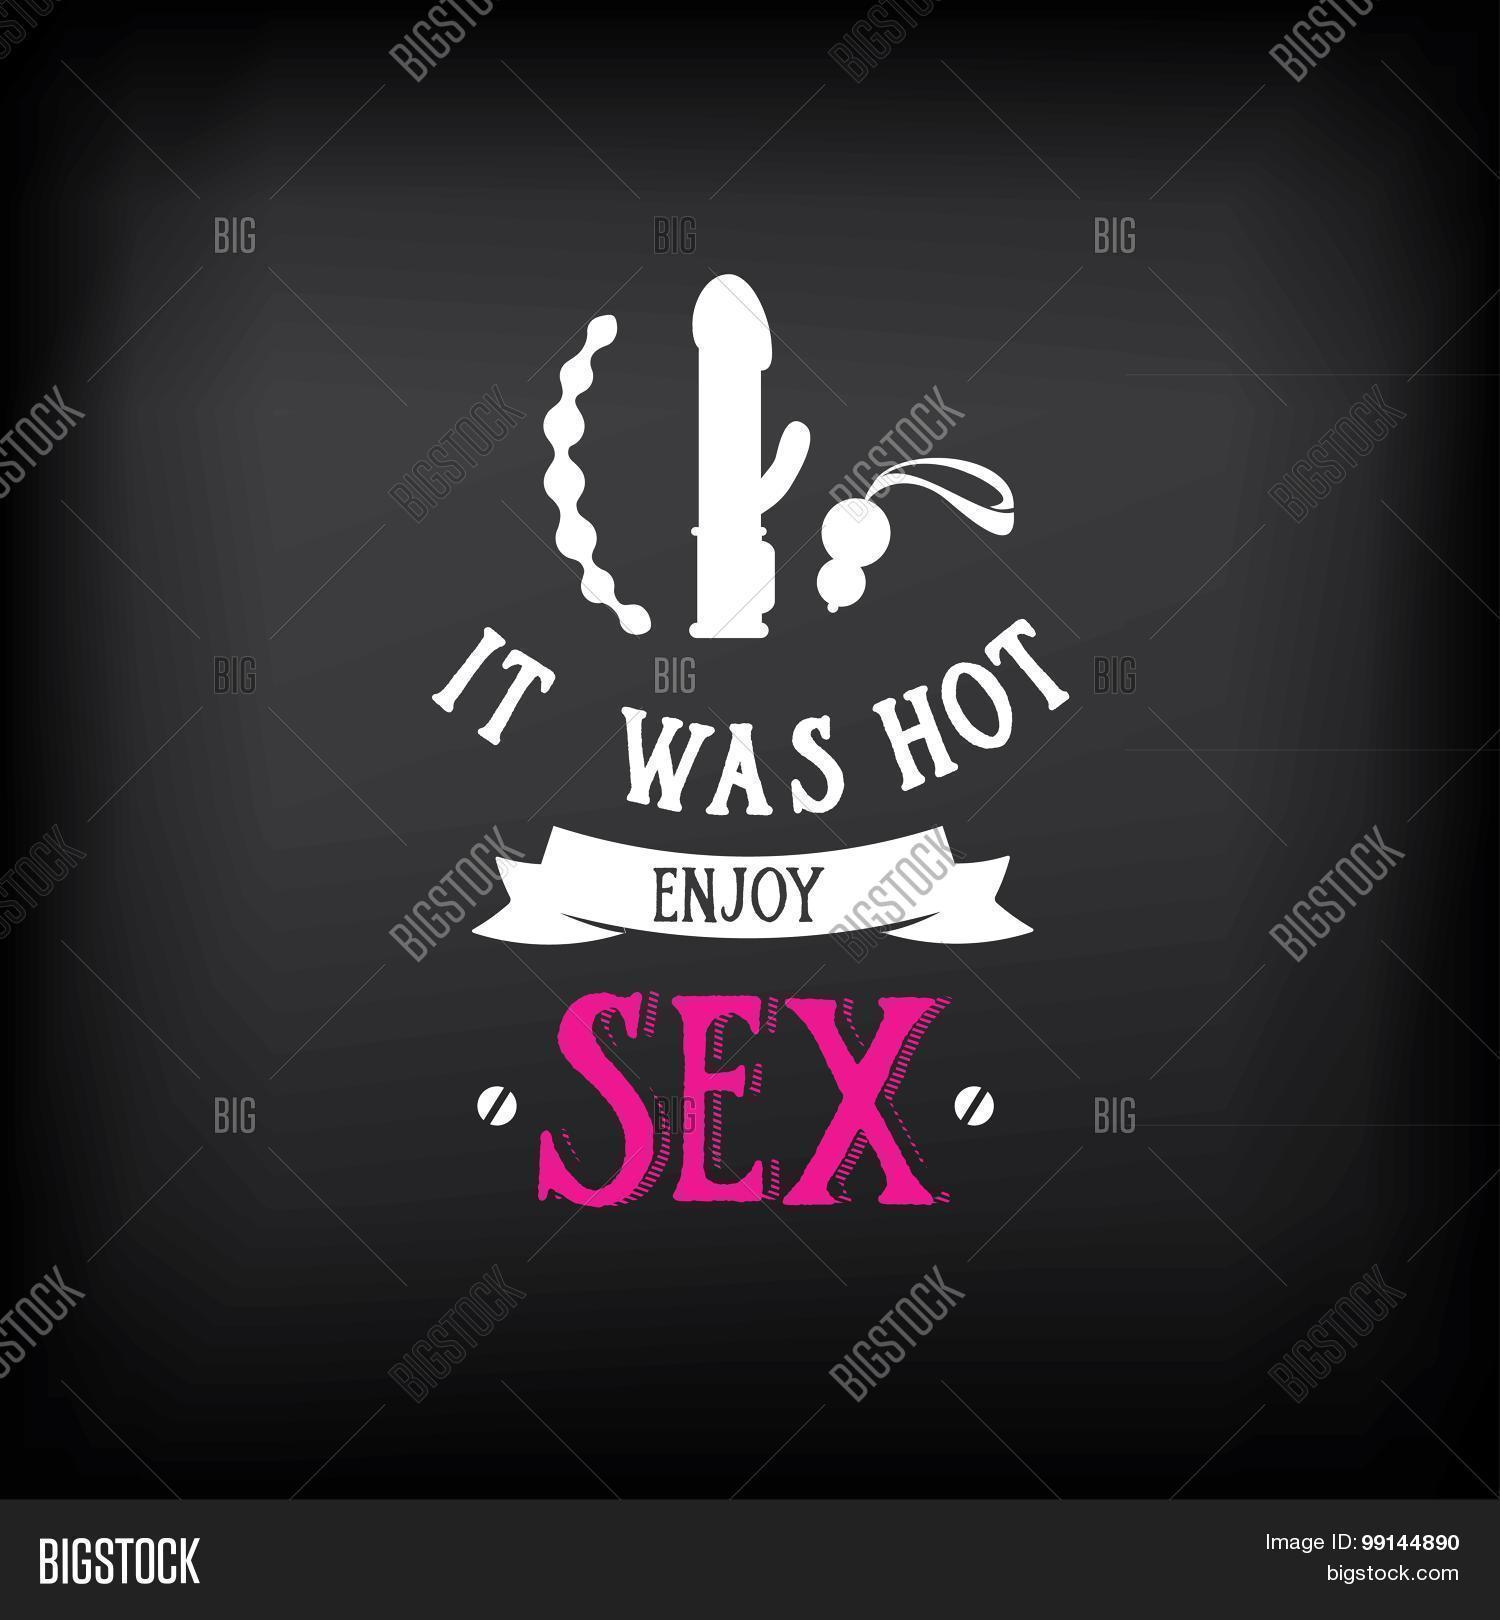 Logo sex Sex and